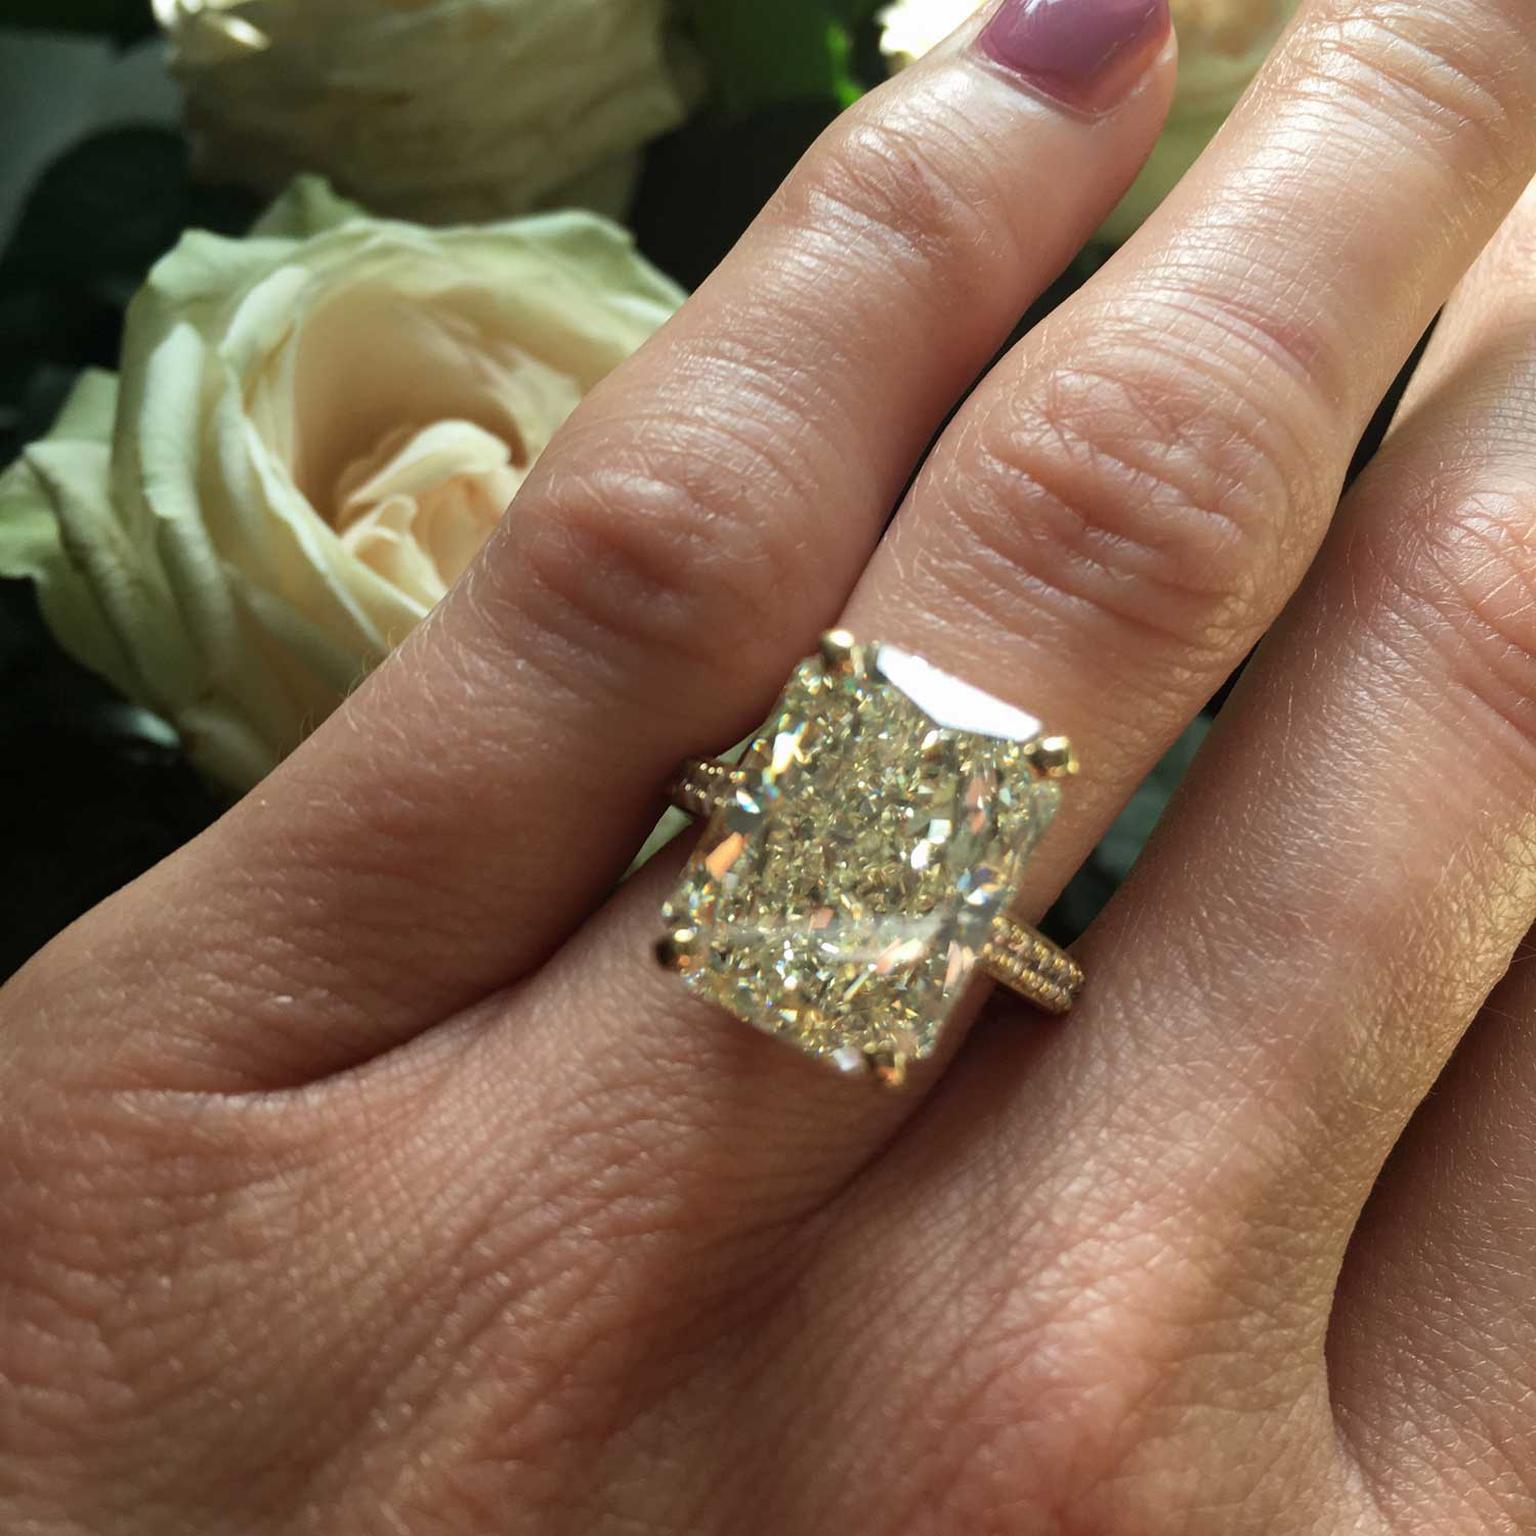 Old Bond Street 1177 Carat Radiant Cut Diamond Engagement